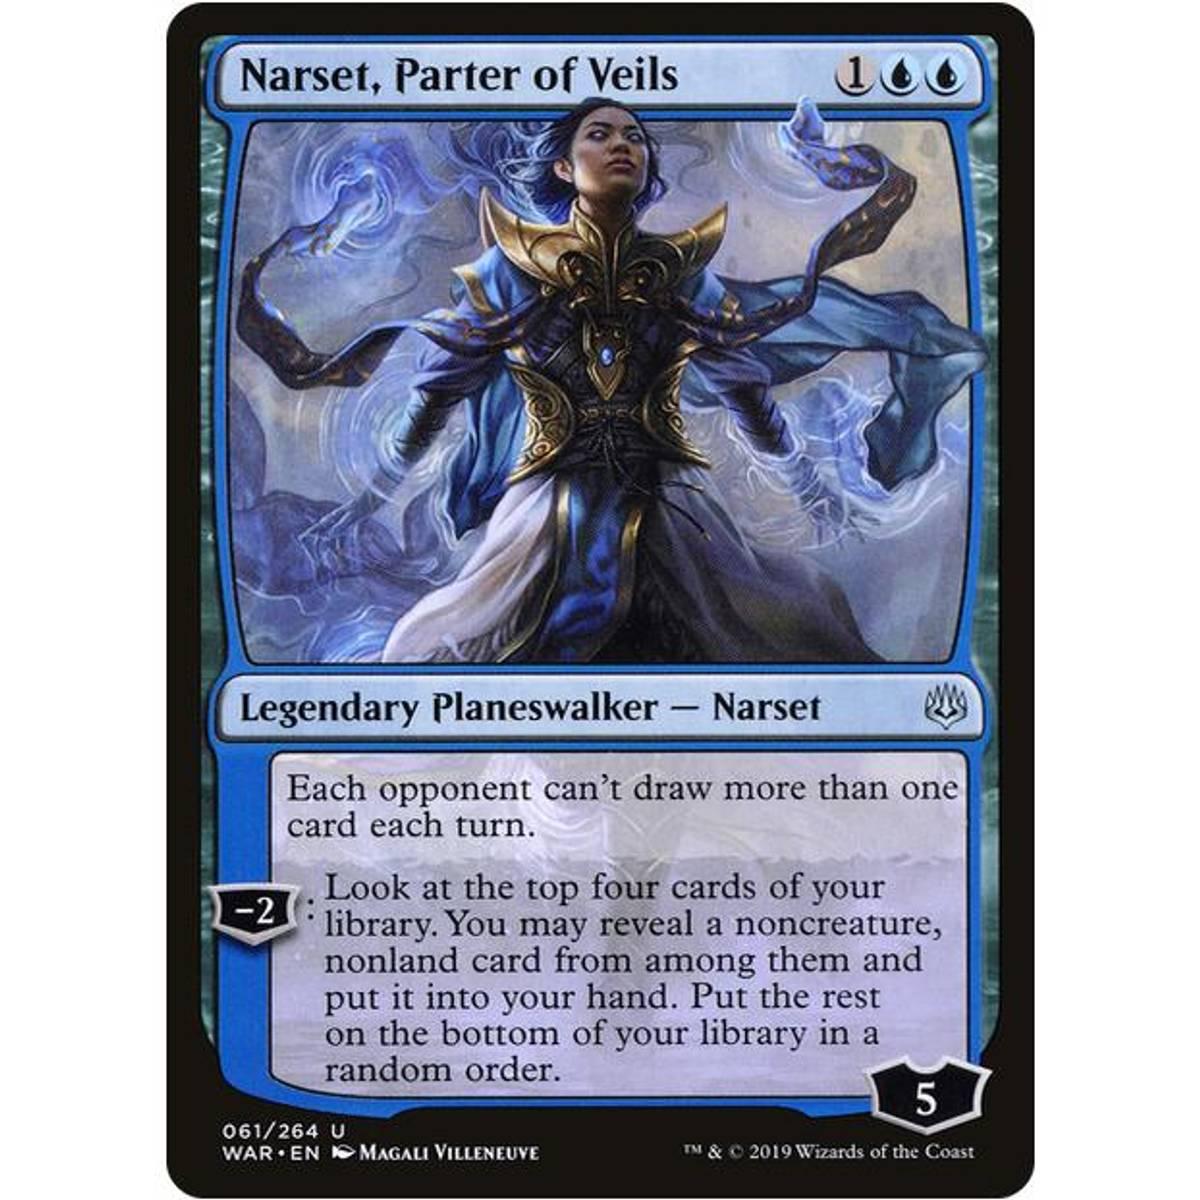 Narset, Parter of Veils